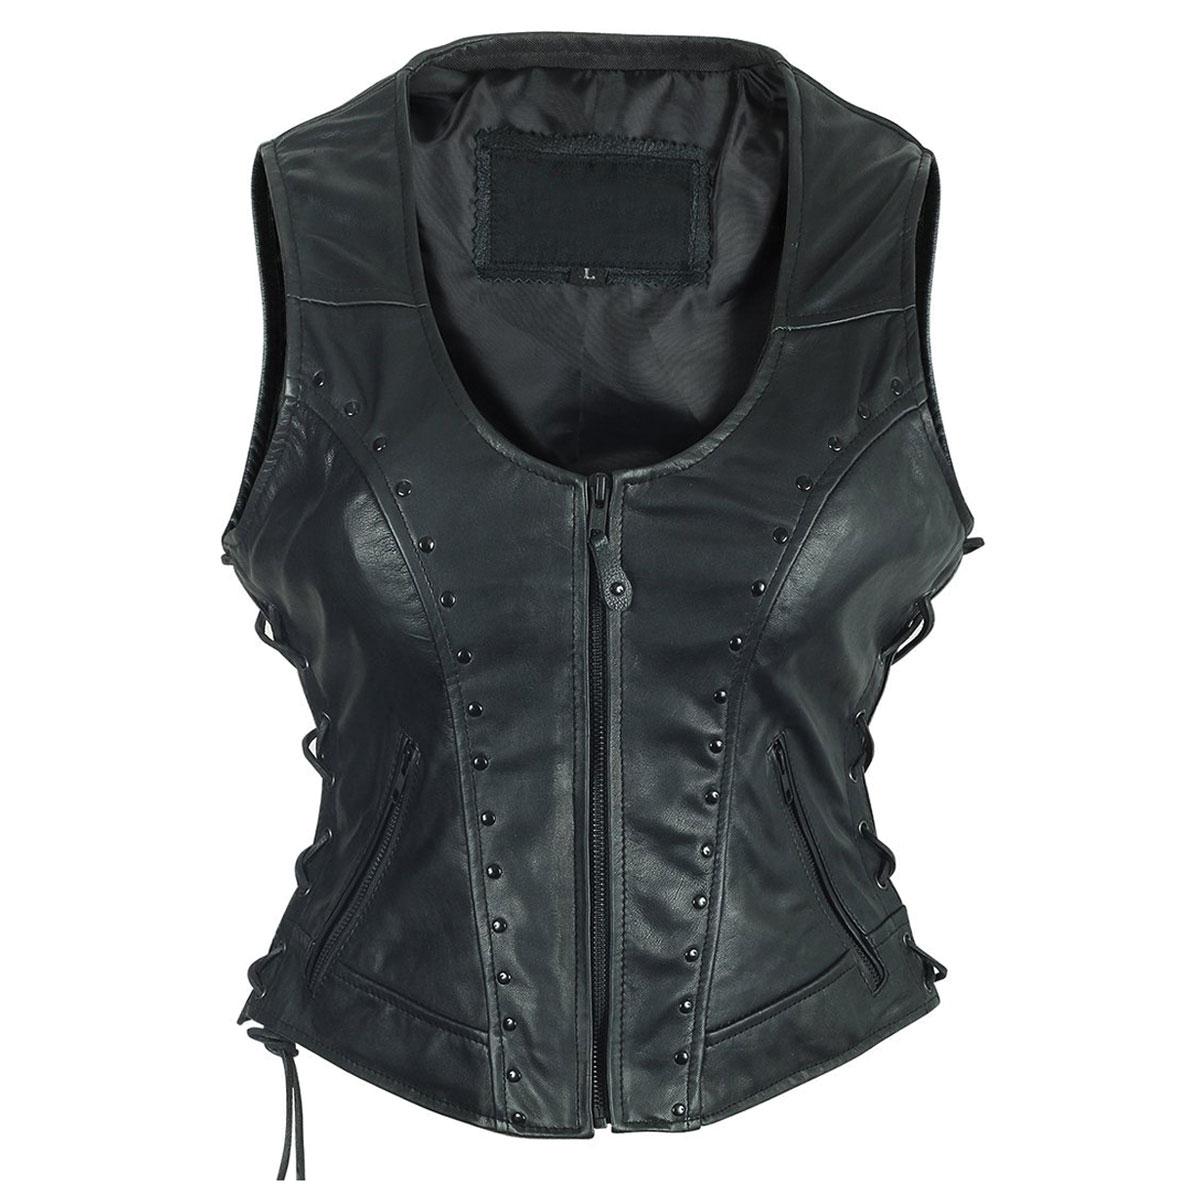 Vance Leathers Women's Studded Black Leather Vest